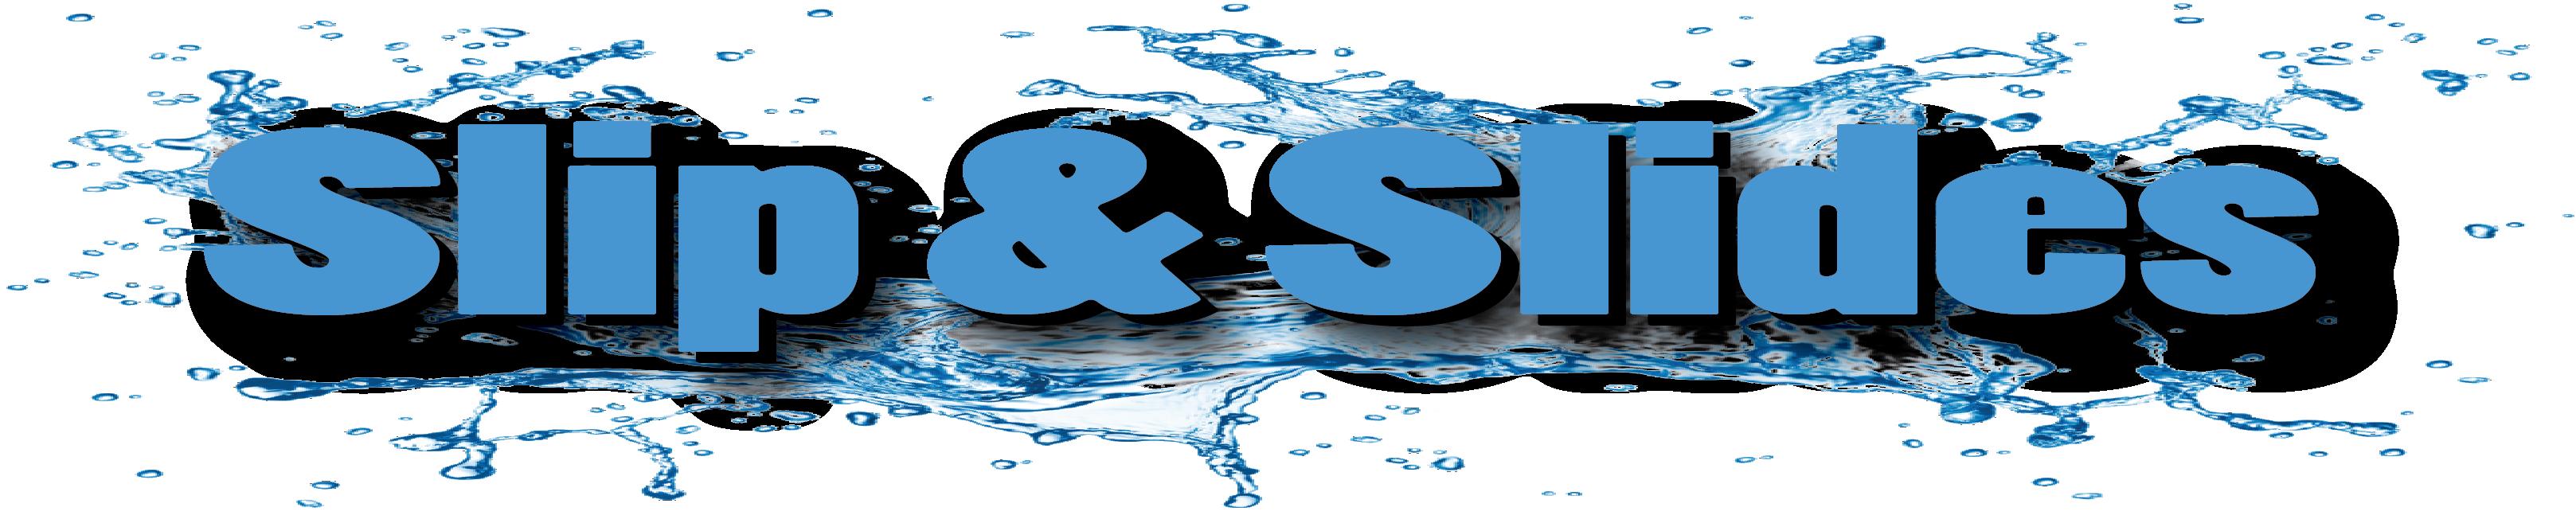 Index of slides images. Water clipart water slide